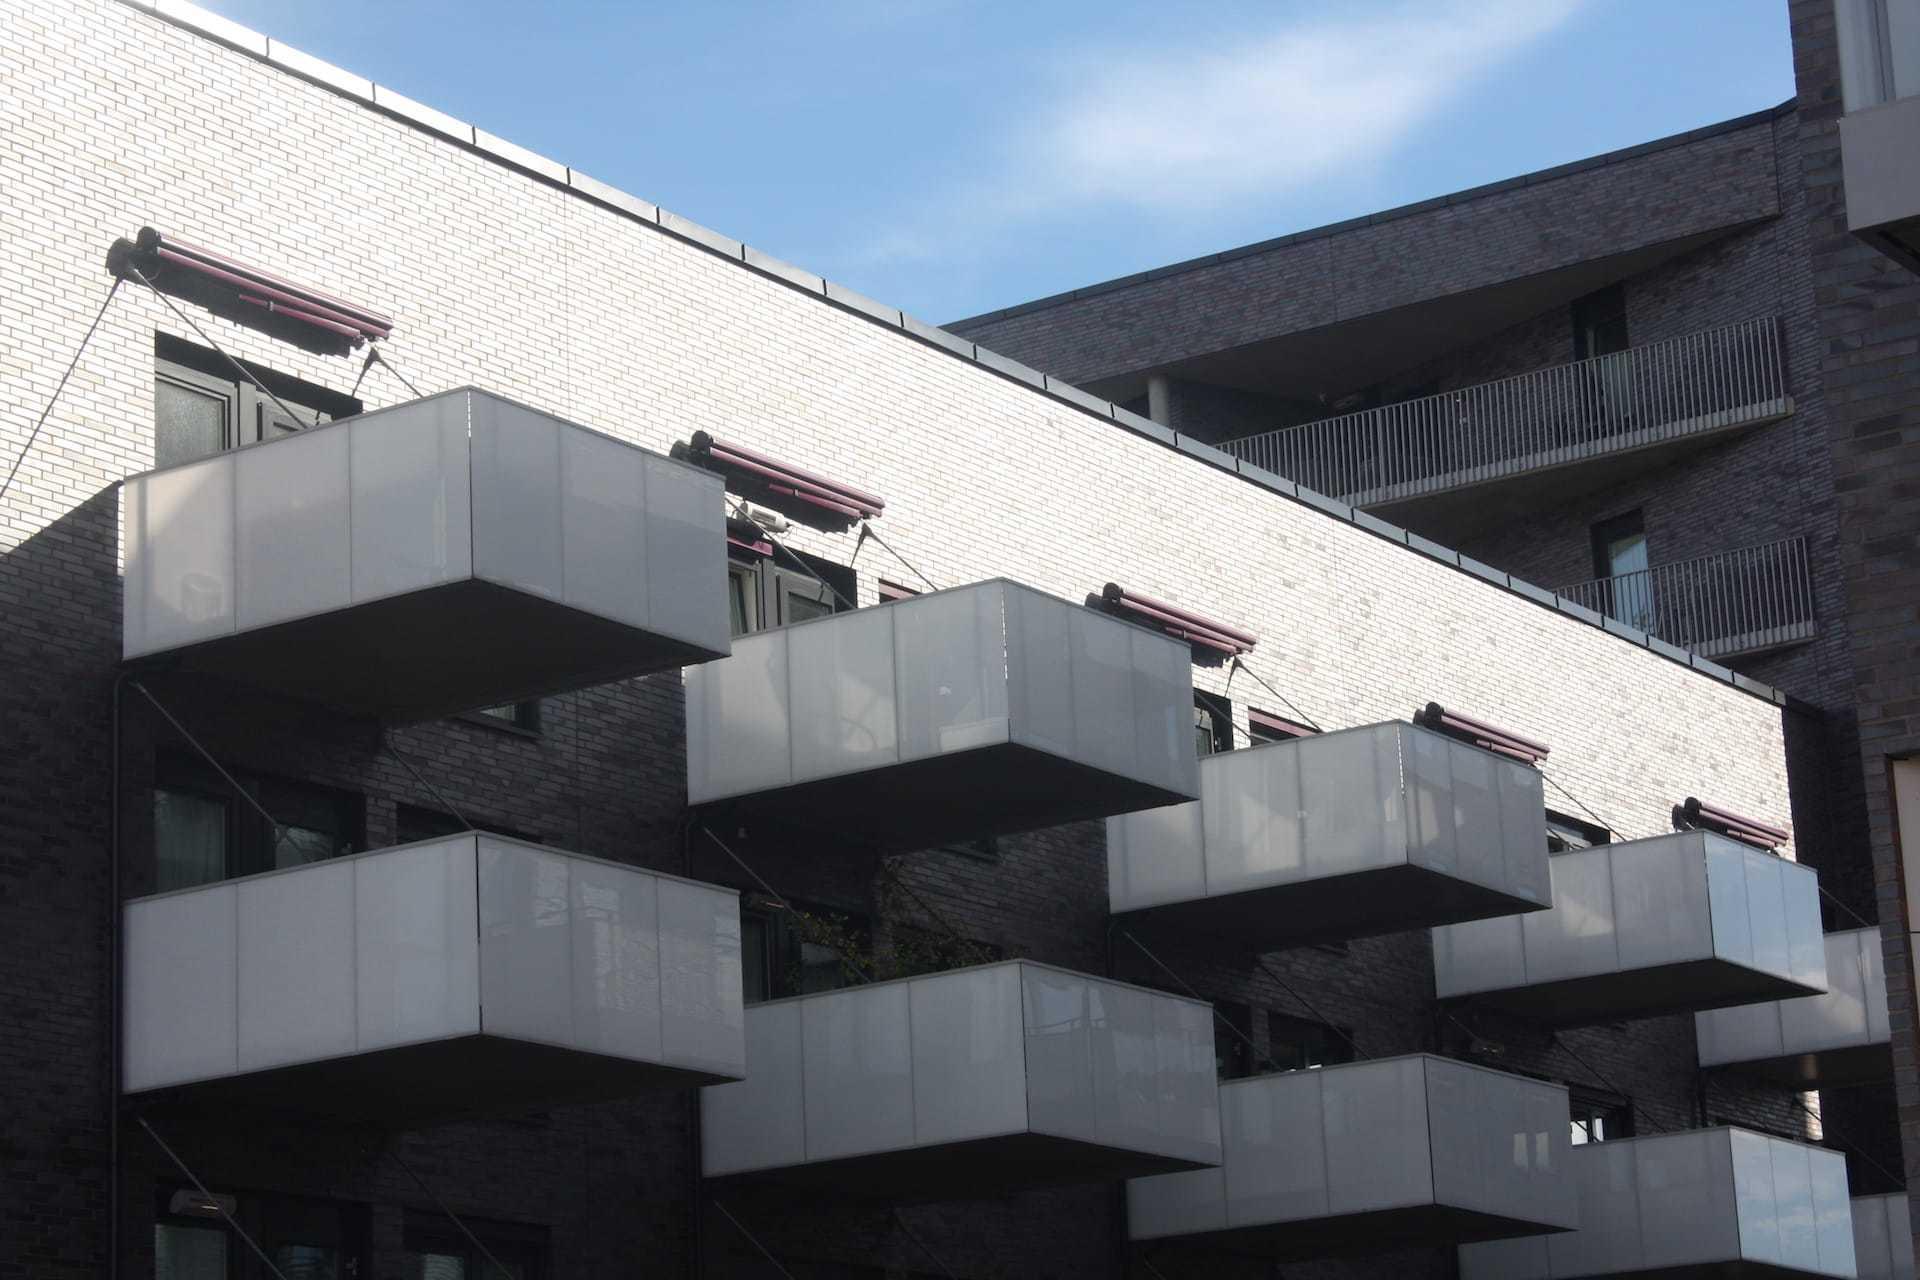 Sørengkaia Byggetrinn 4, Oslo